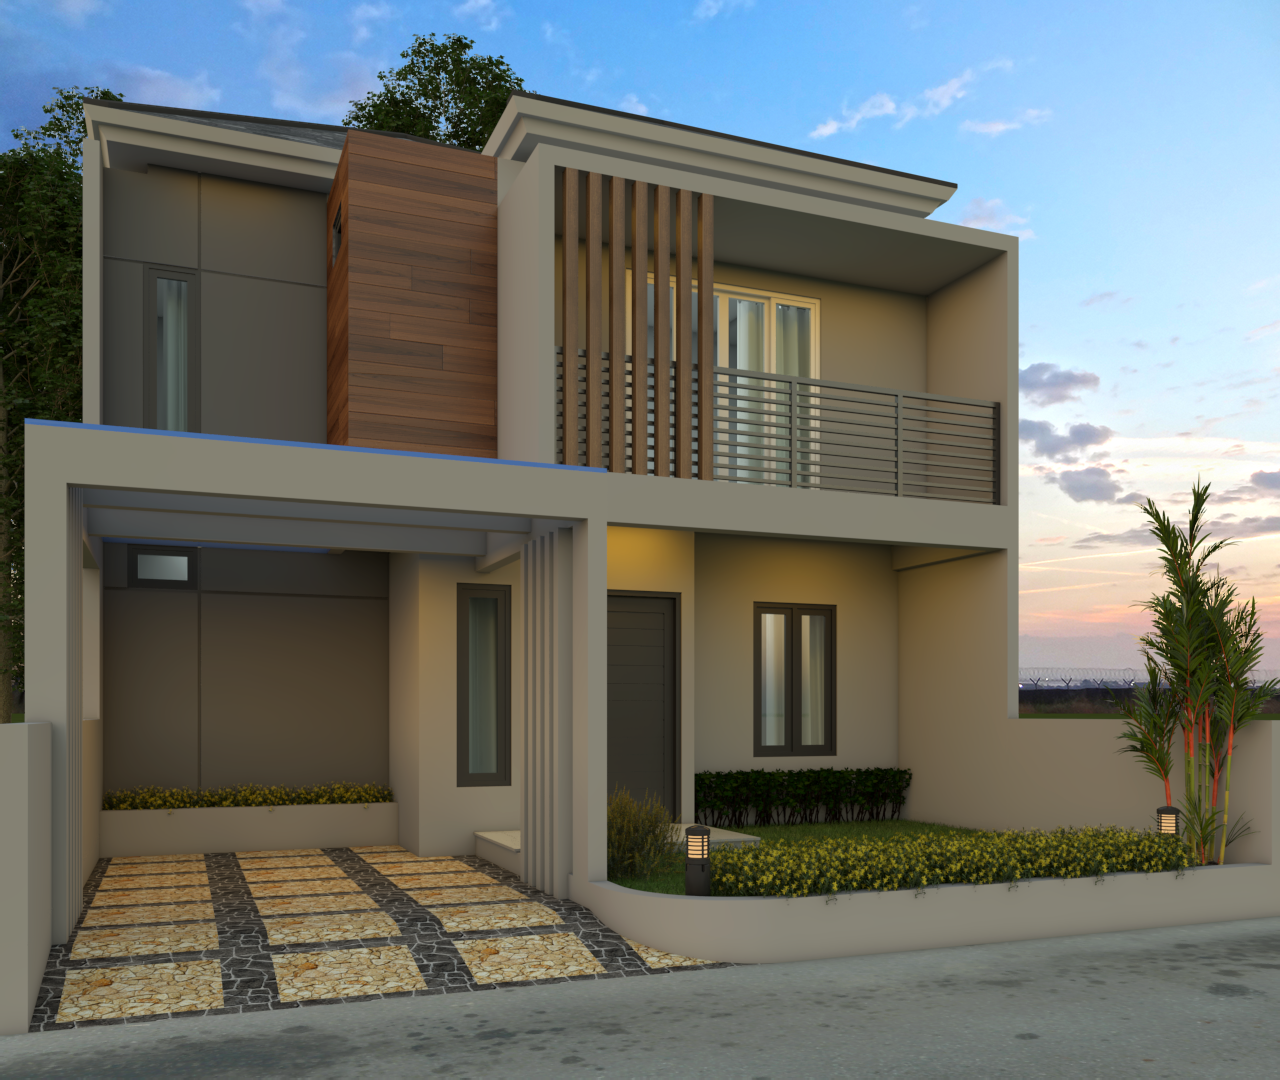 6.Denoiser - Desain Rumah Minimalis 2 Lantai